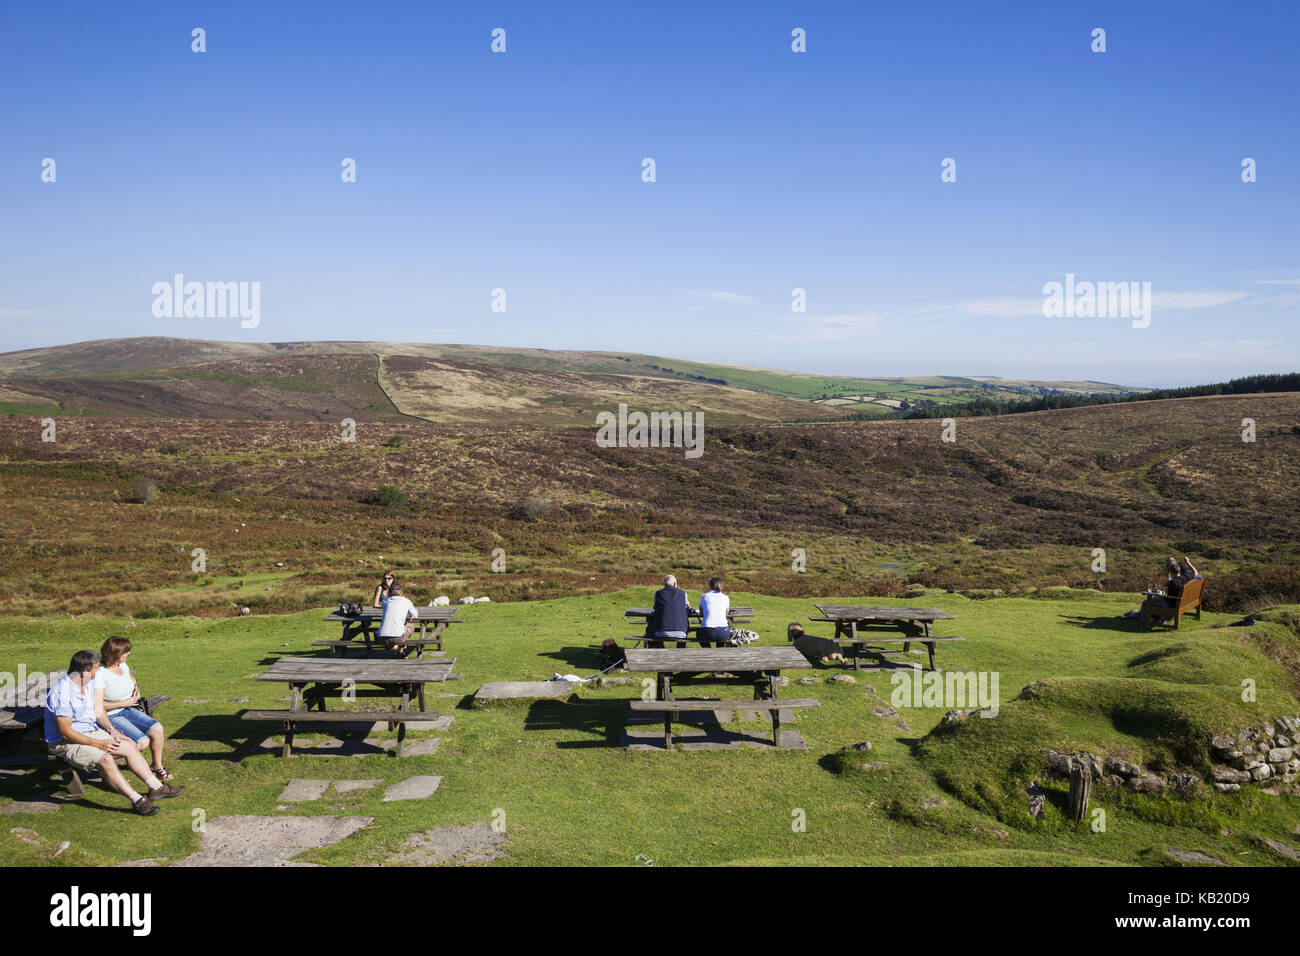 England, Devon, Dartmoor, lookout, resting place, tourist, - Stock Image